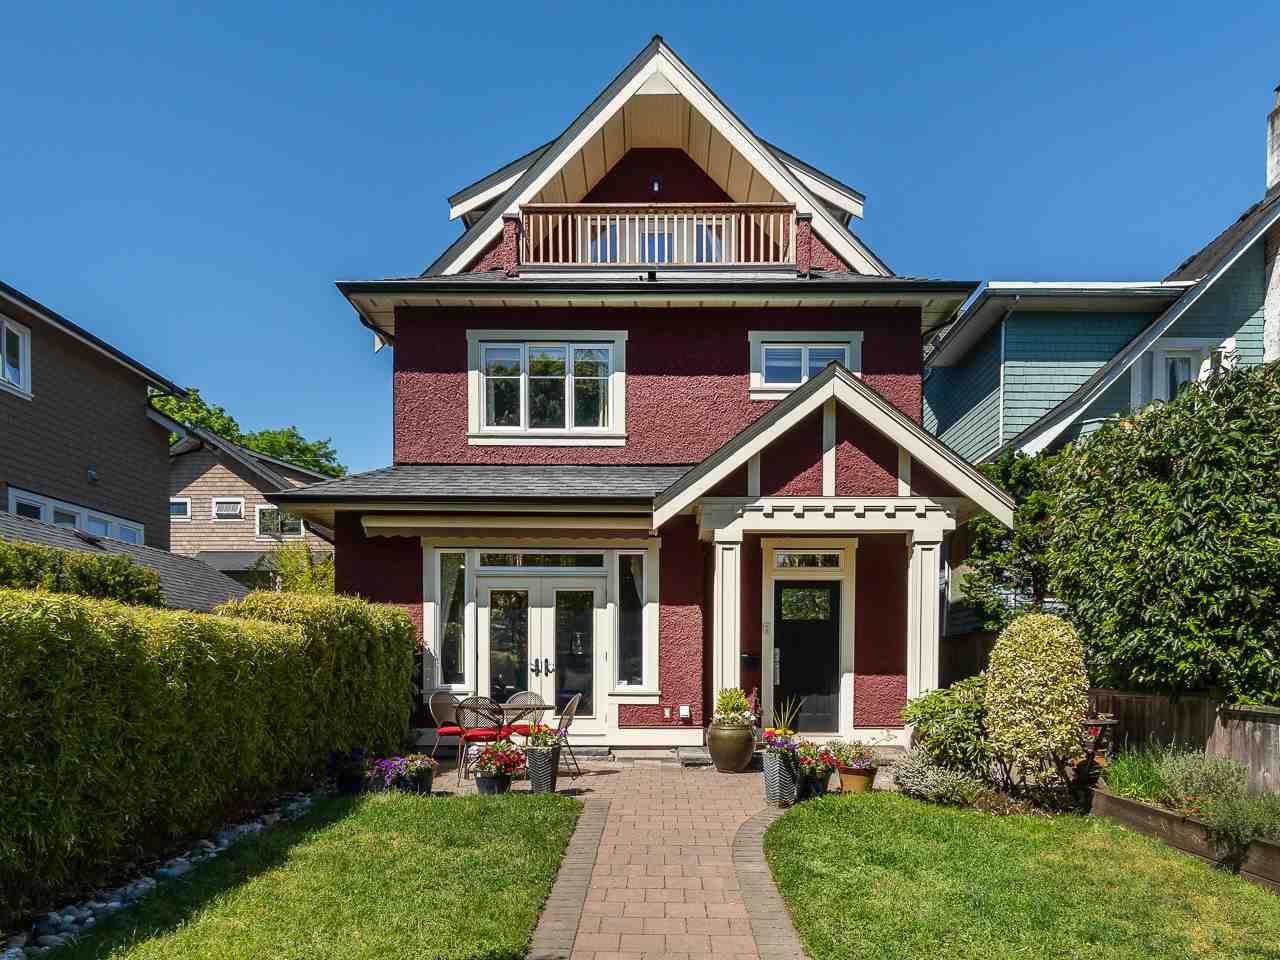 "Main Photo: 3485 W 2ND Avenue in Vancouver: Kitsilano House 1/2 Duplex for sale in ""KITSILANO"" (Vancouver West)  : MLS®# R2369213"